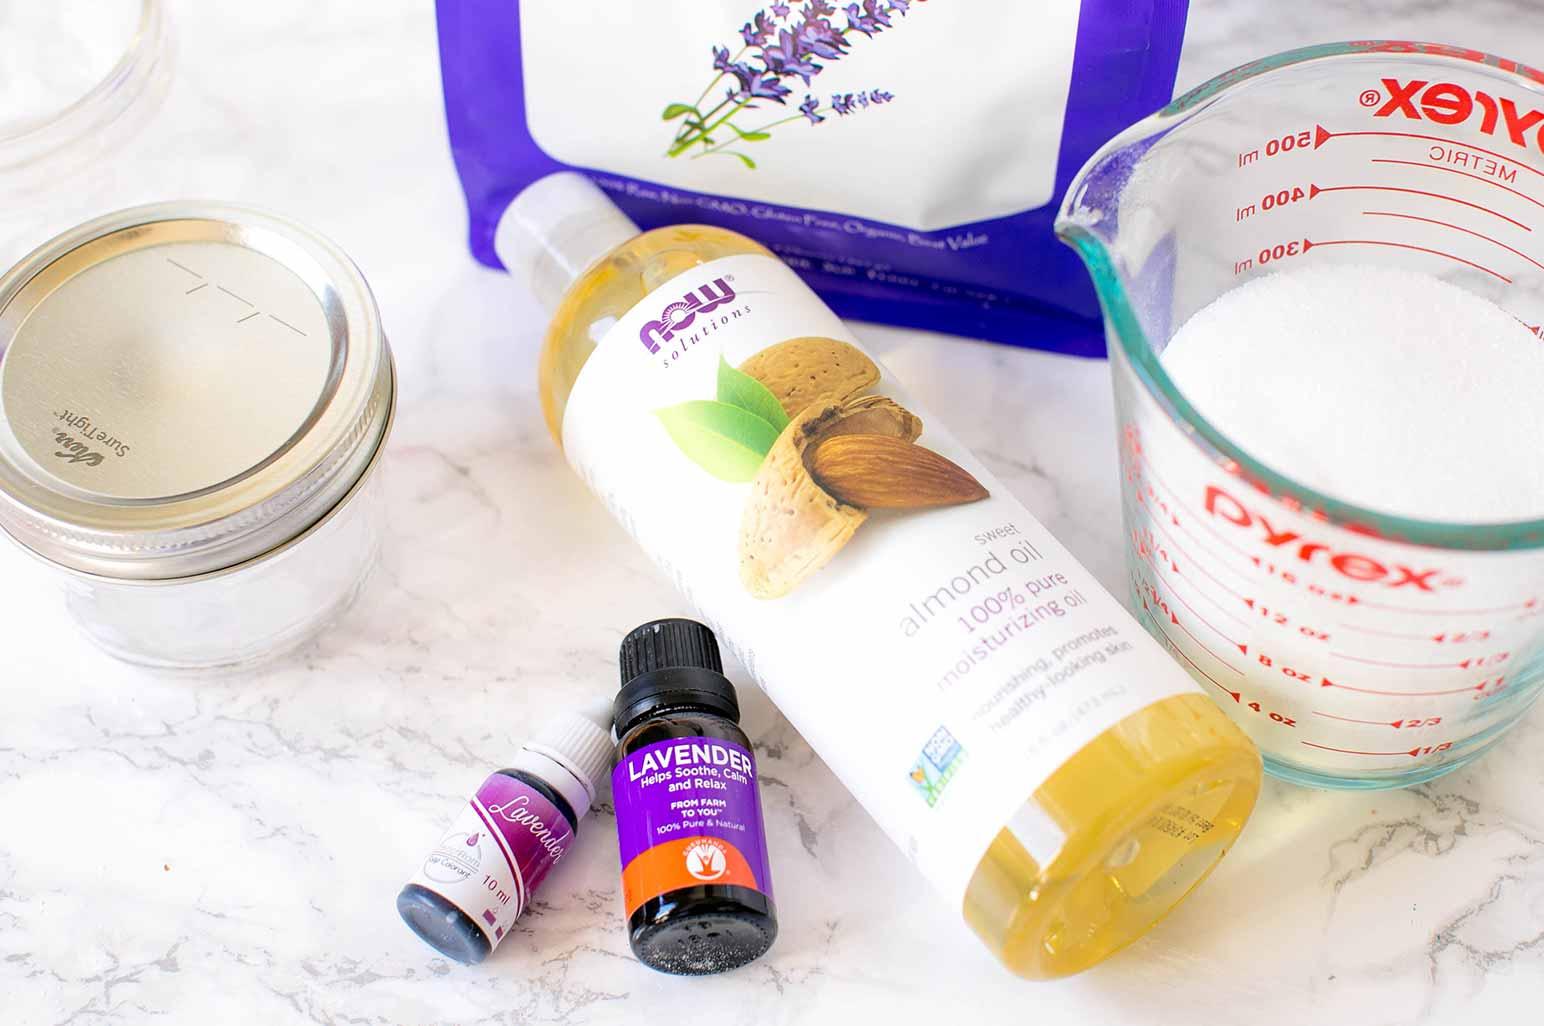 DIY Lavender Sugar Scrub Supplies